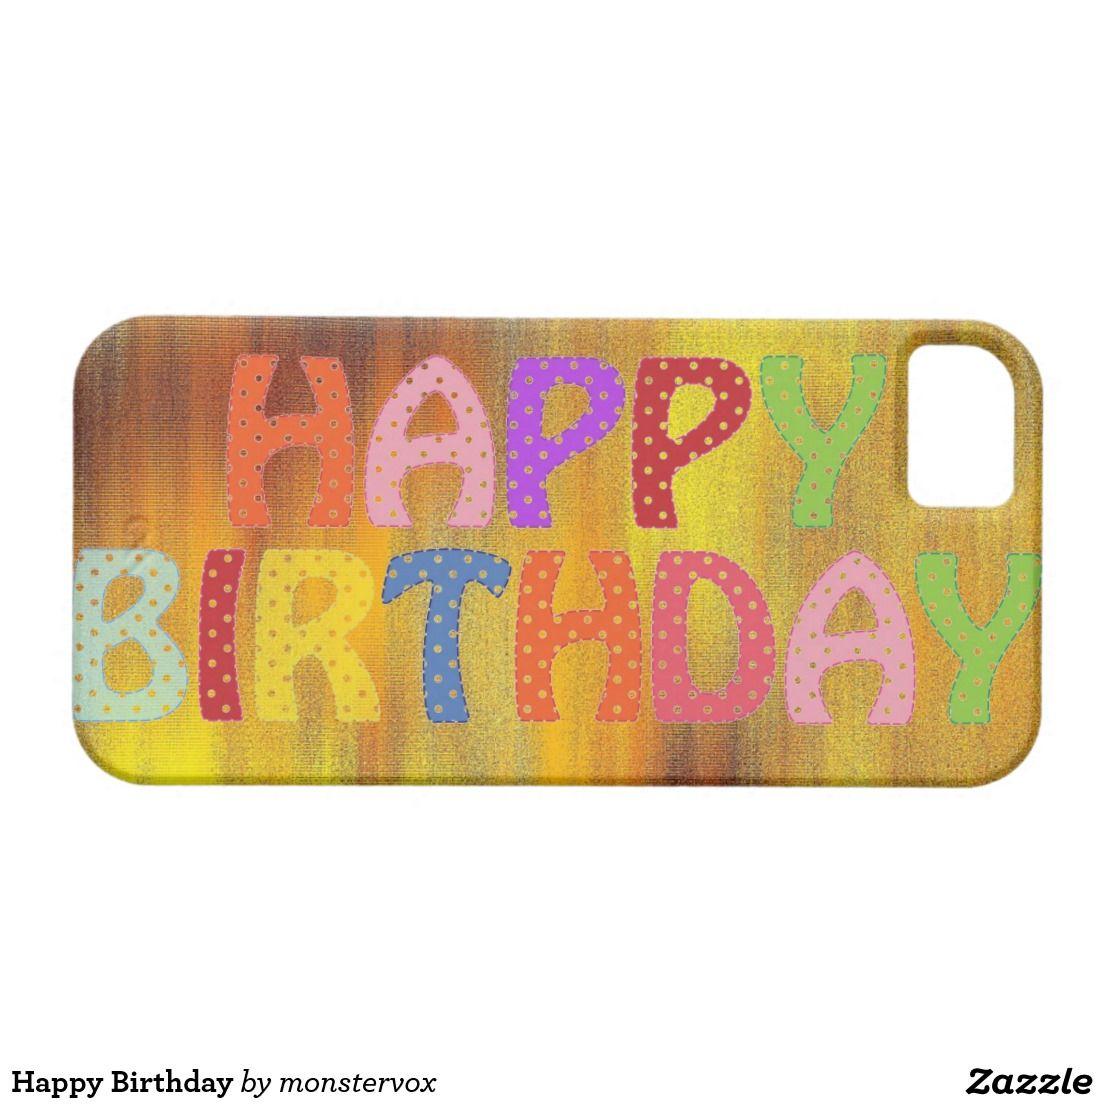 Happy Birthday iPhone SE/5/5s Case #HappyBirthday #Birthday #Party #Celebration #Art #Fashion #Mobile #Phone #Case #Cover #iPhone